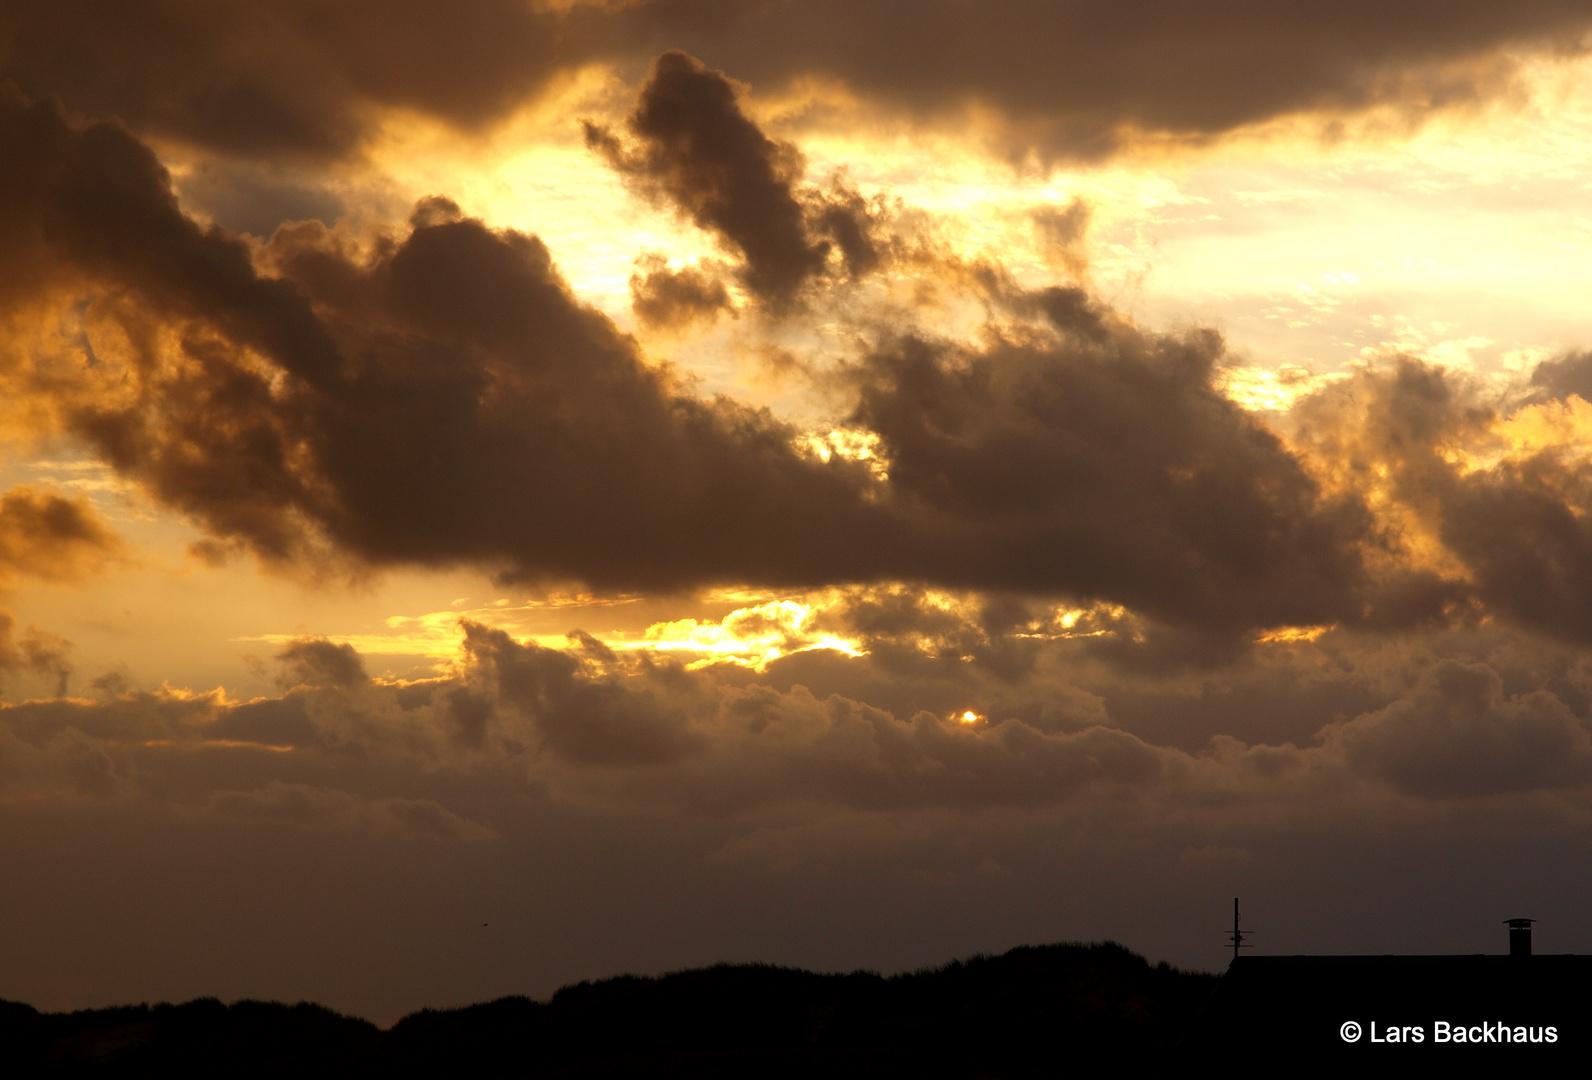 Sunset in Klegod